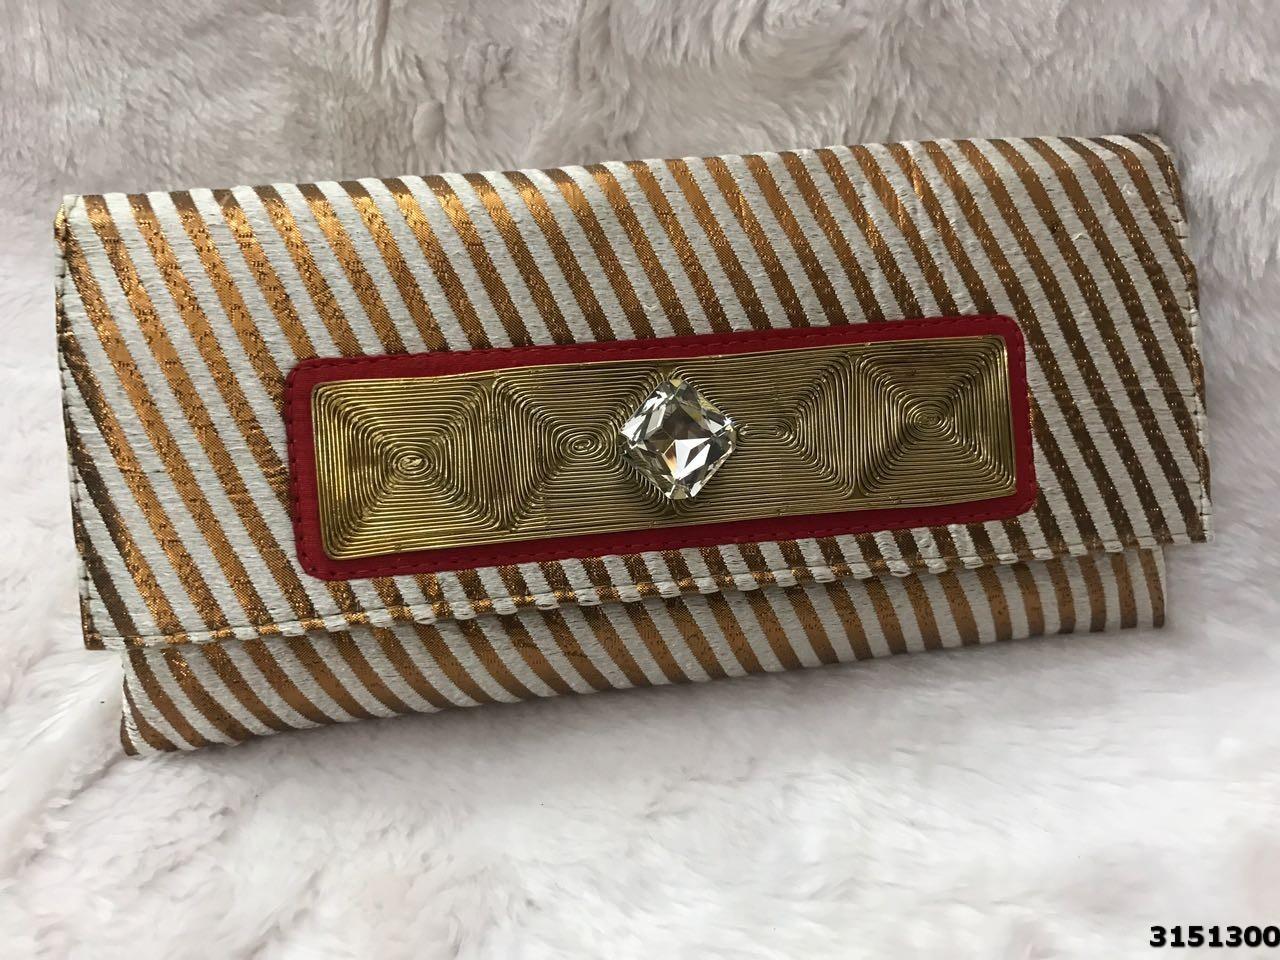 Beautiful Clutch Bags